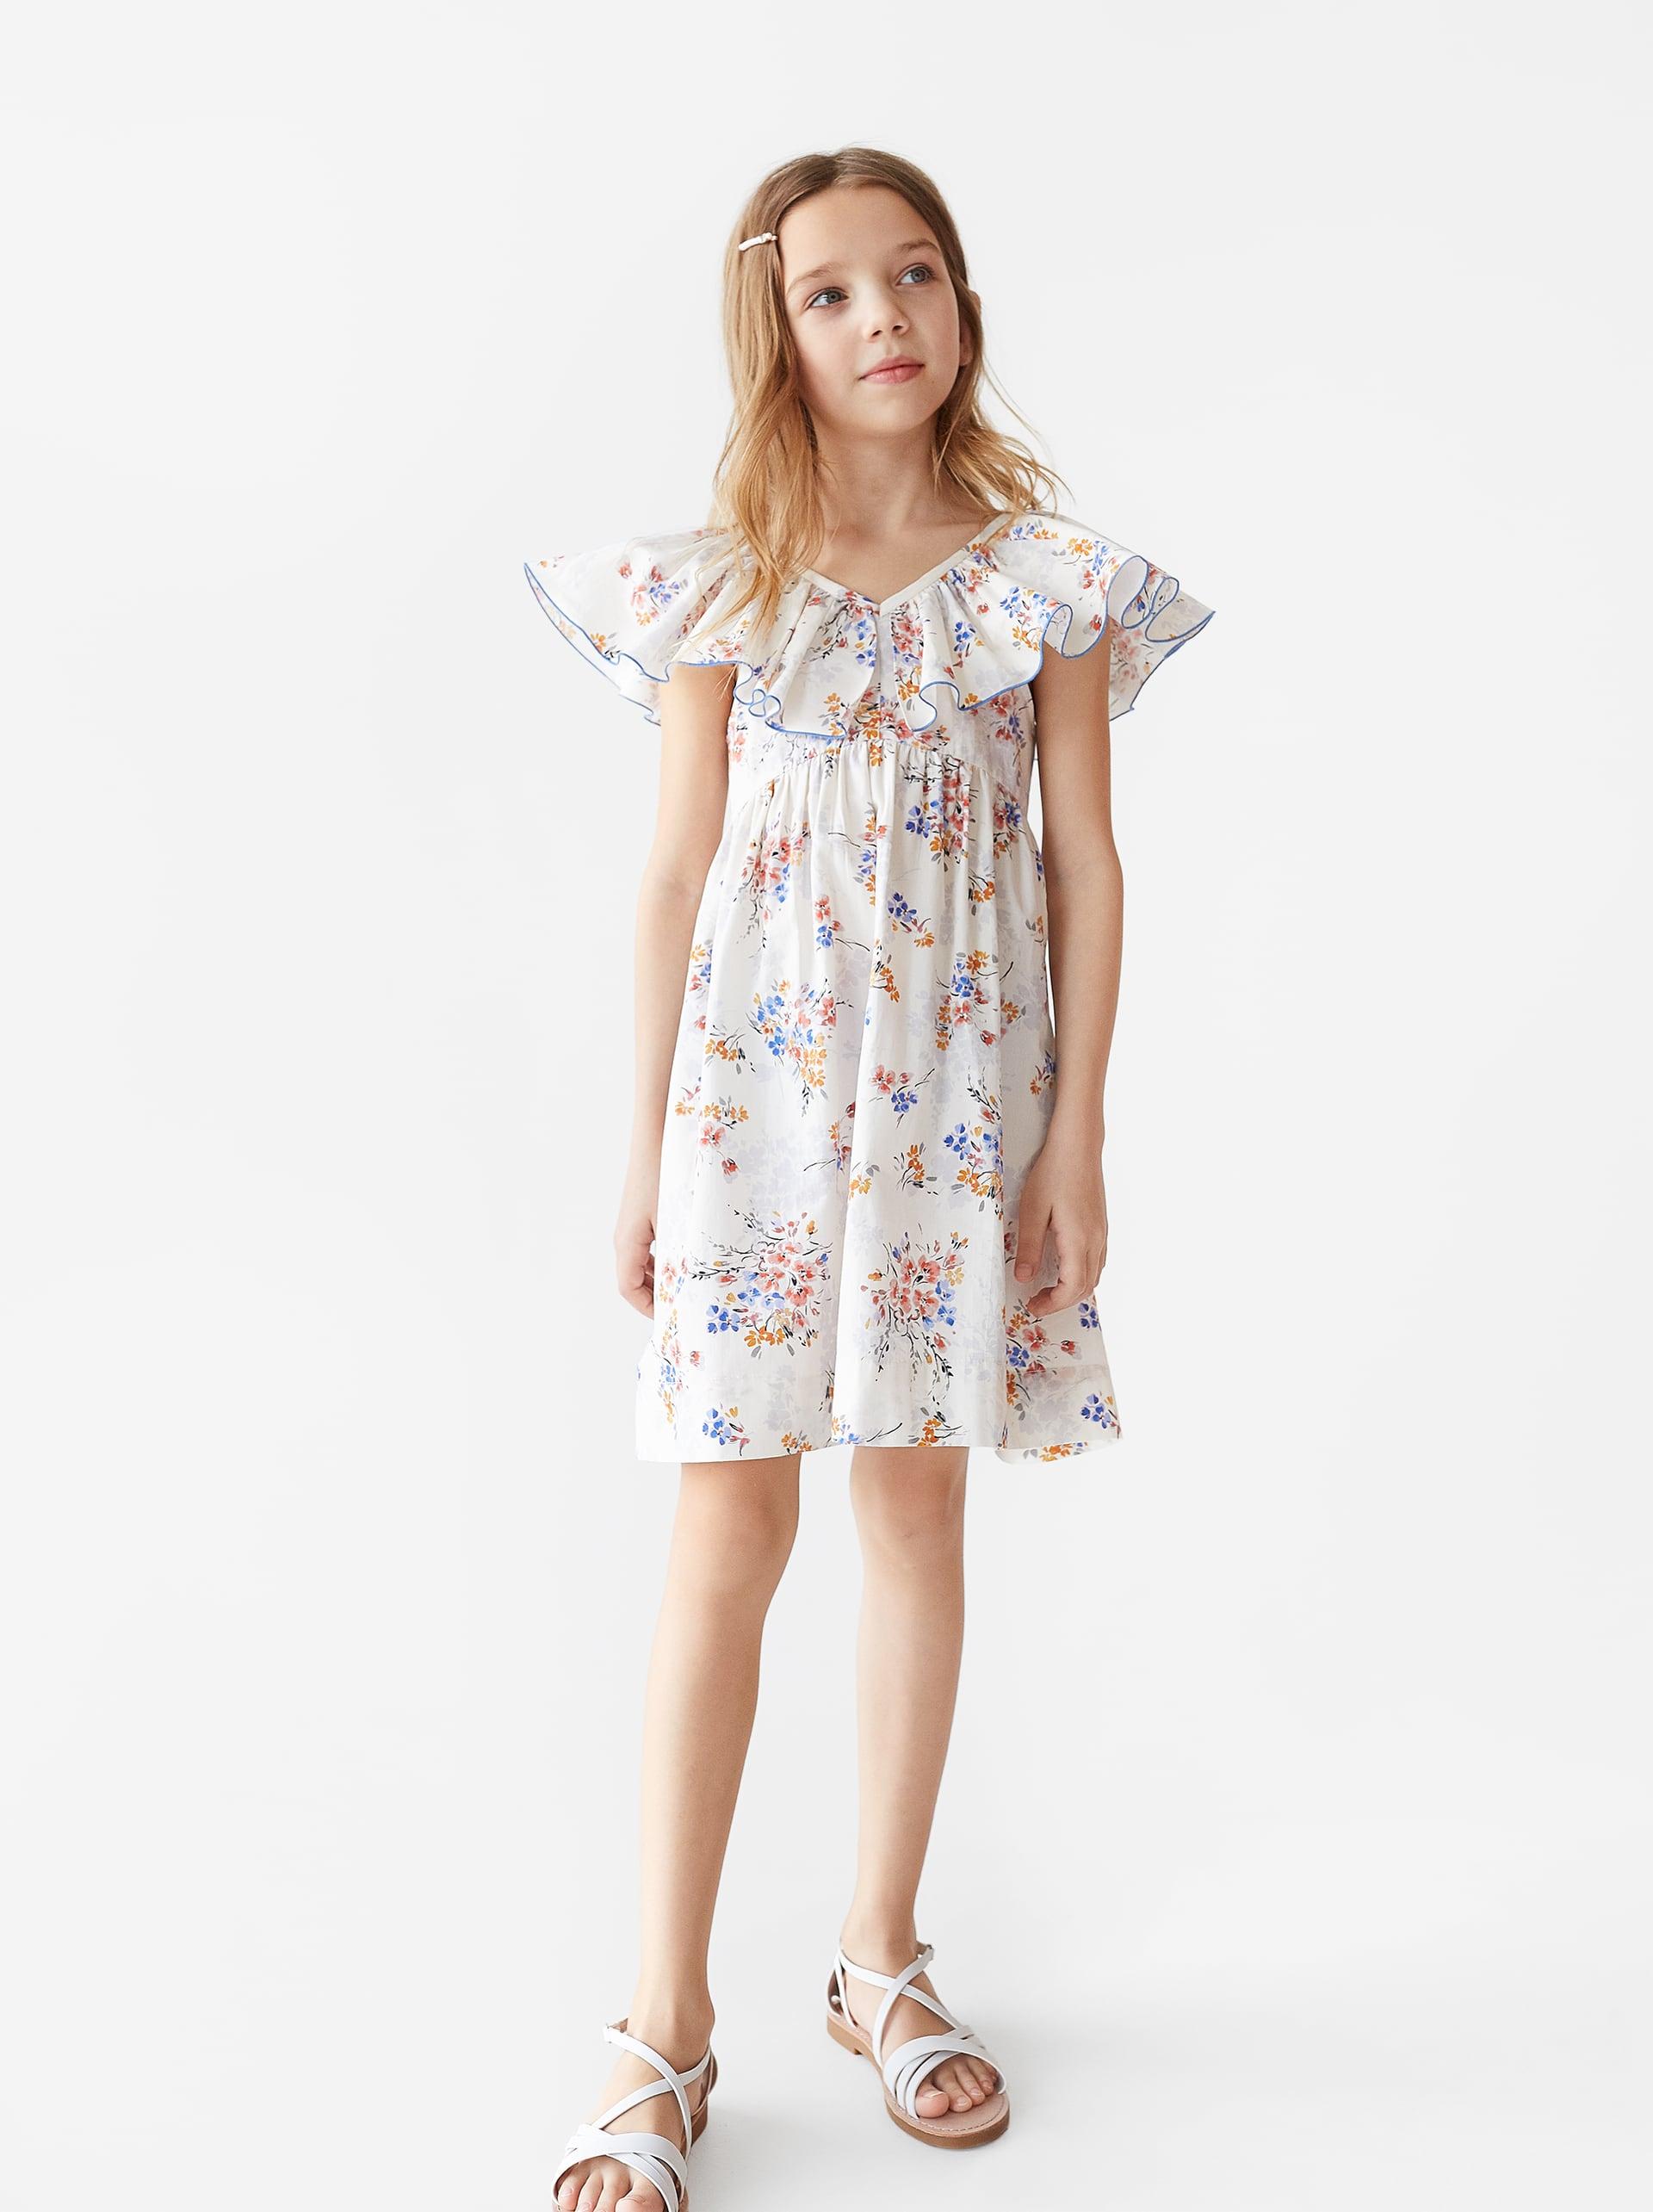 Zara Ruffled Floral Dress